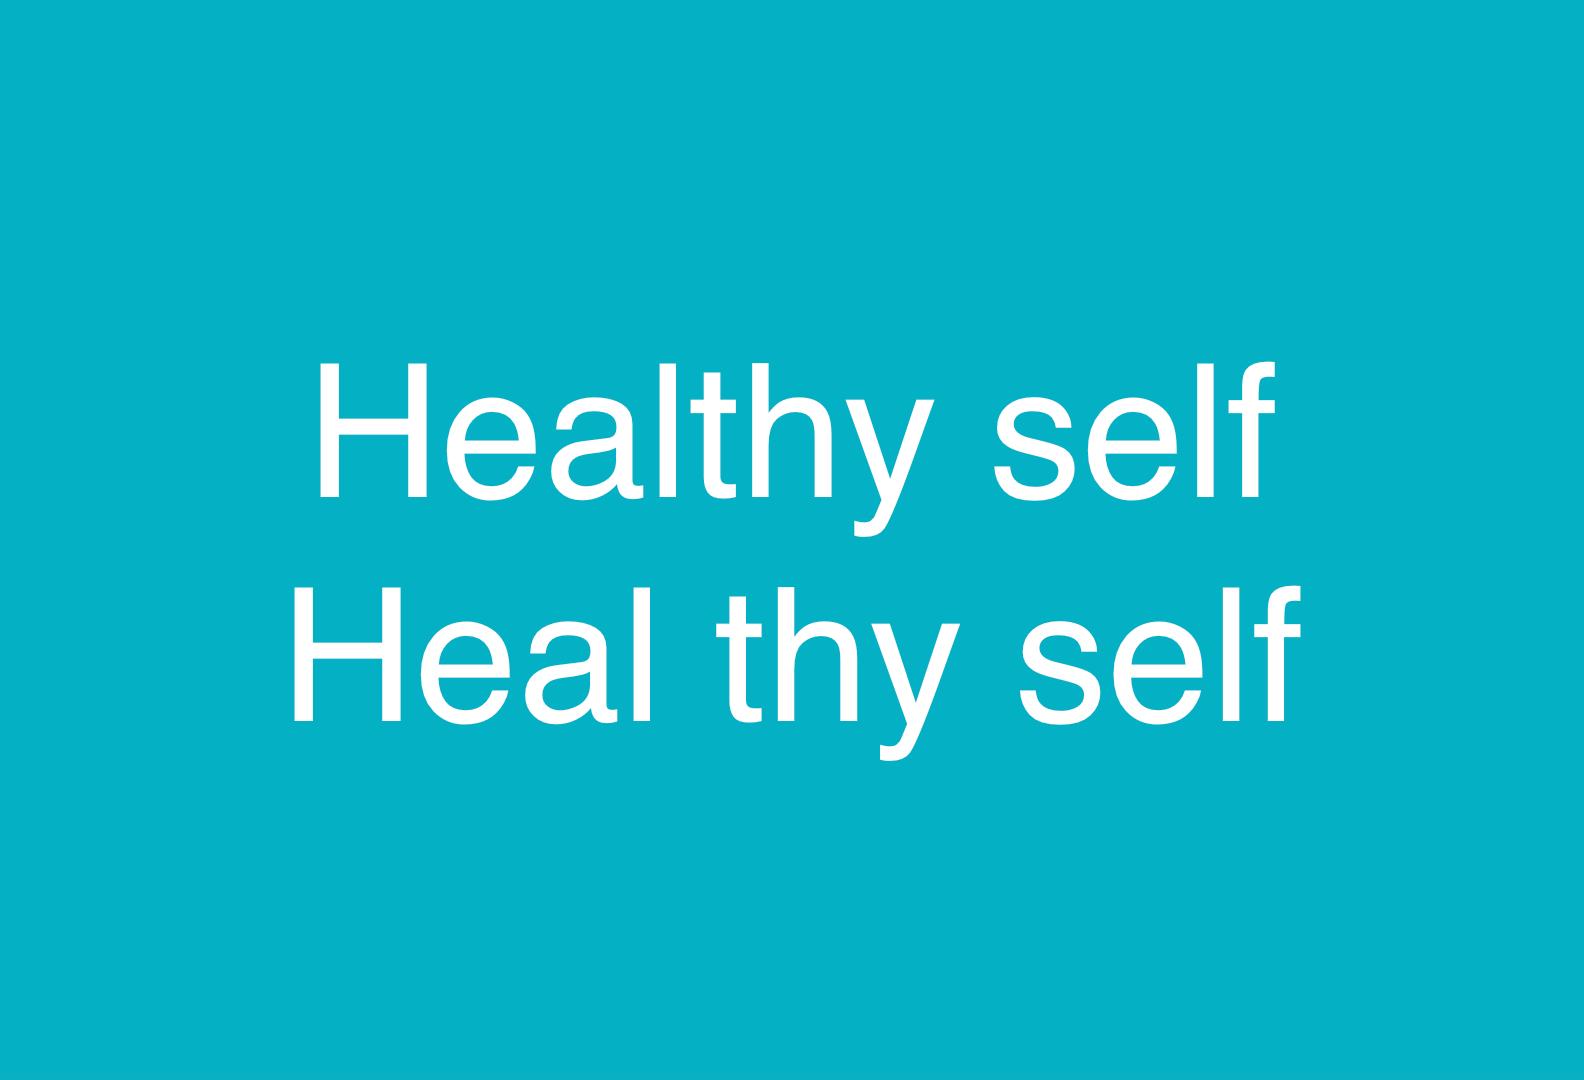 Image of Healthy Self, Heal thy self from CALMERme.com